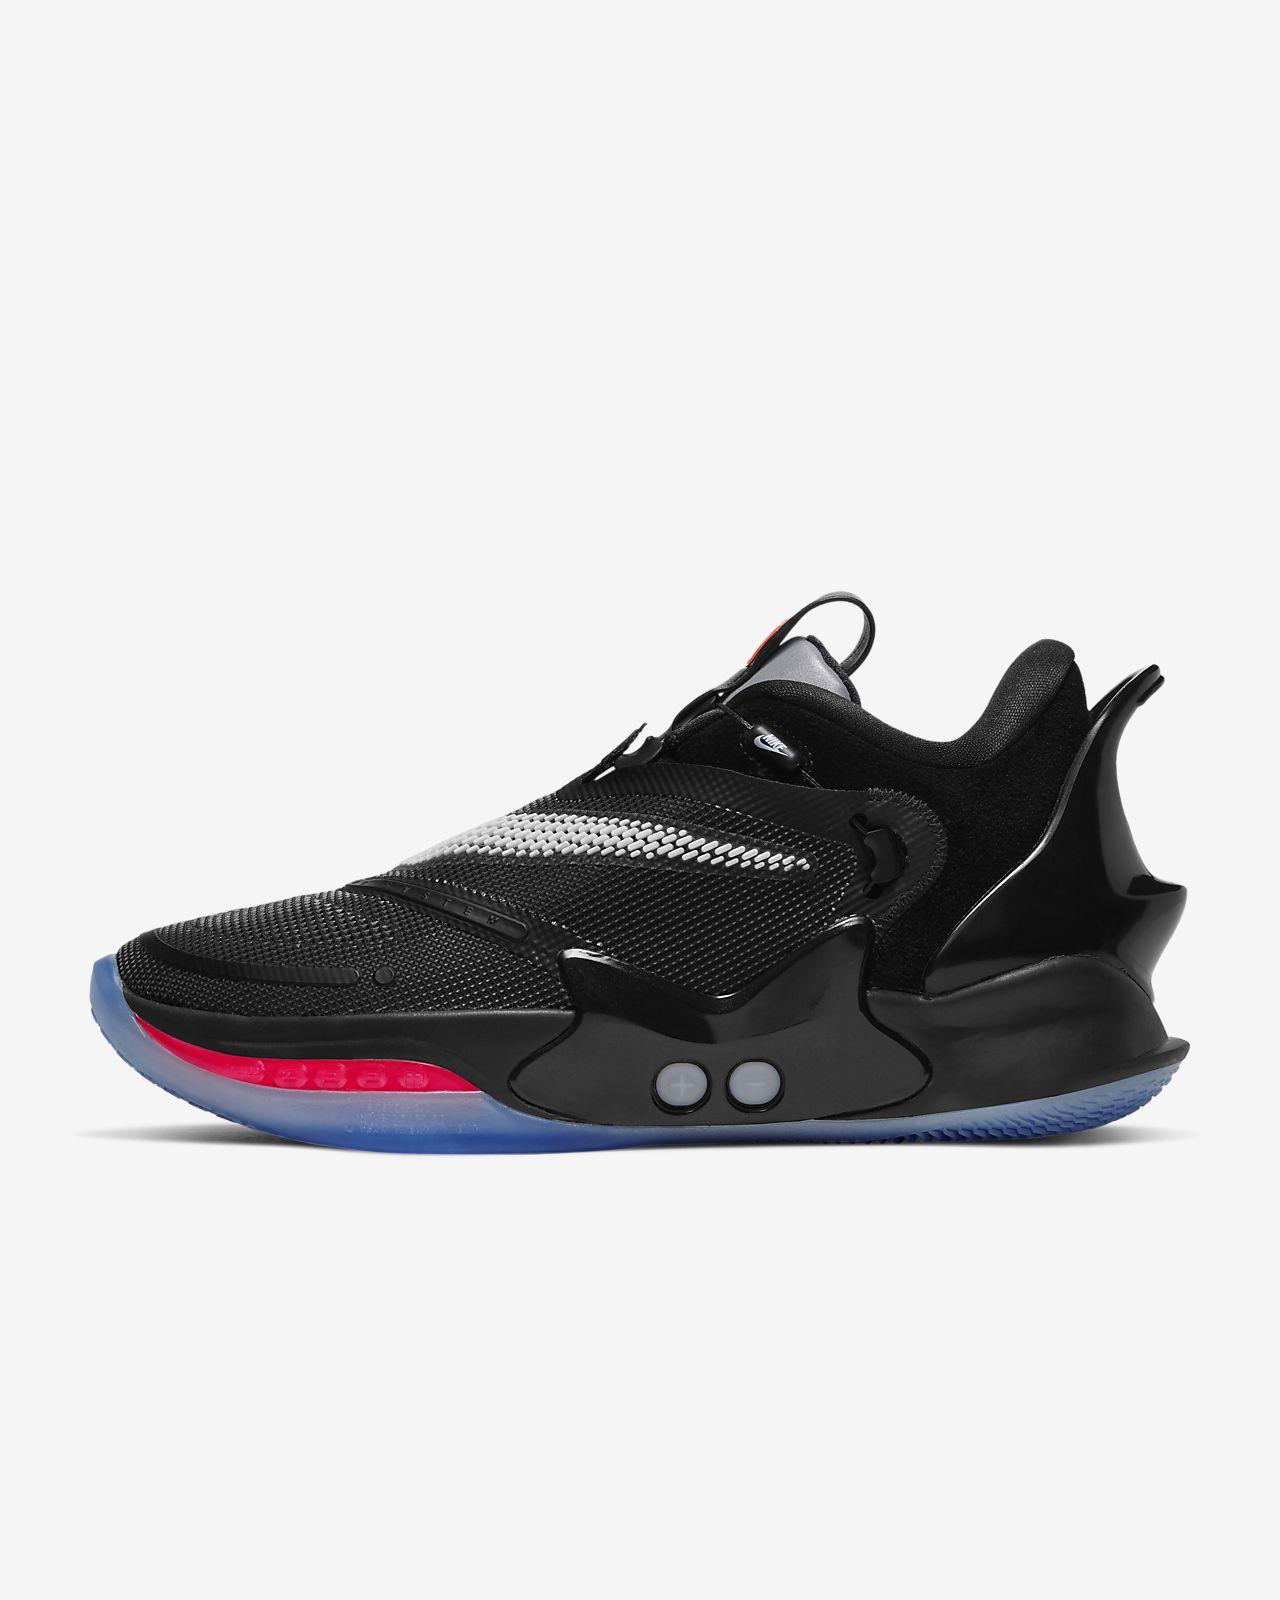 Nike Adapt BB 2.0 Basketballschuh